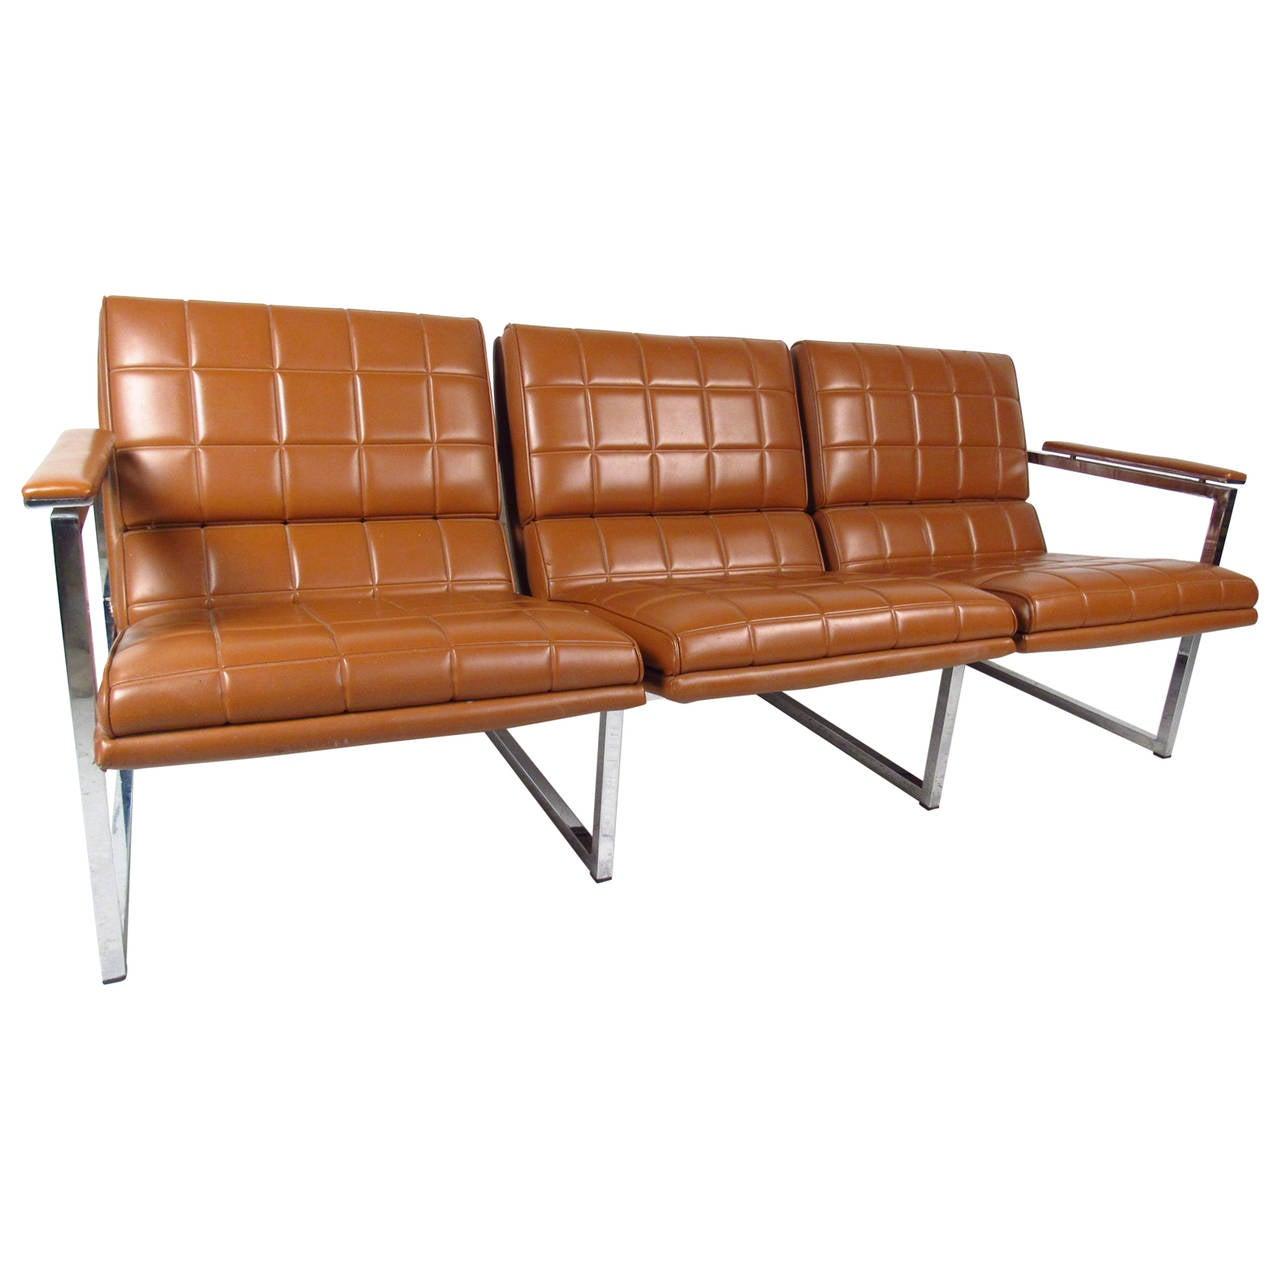 Midcentury Milo Baughman Style Three-Seat Sofa 1